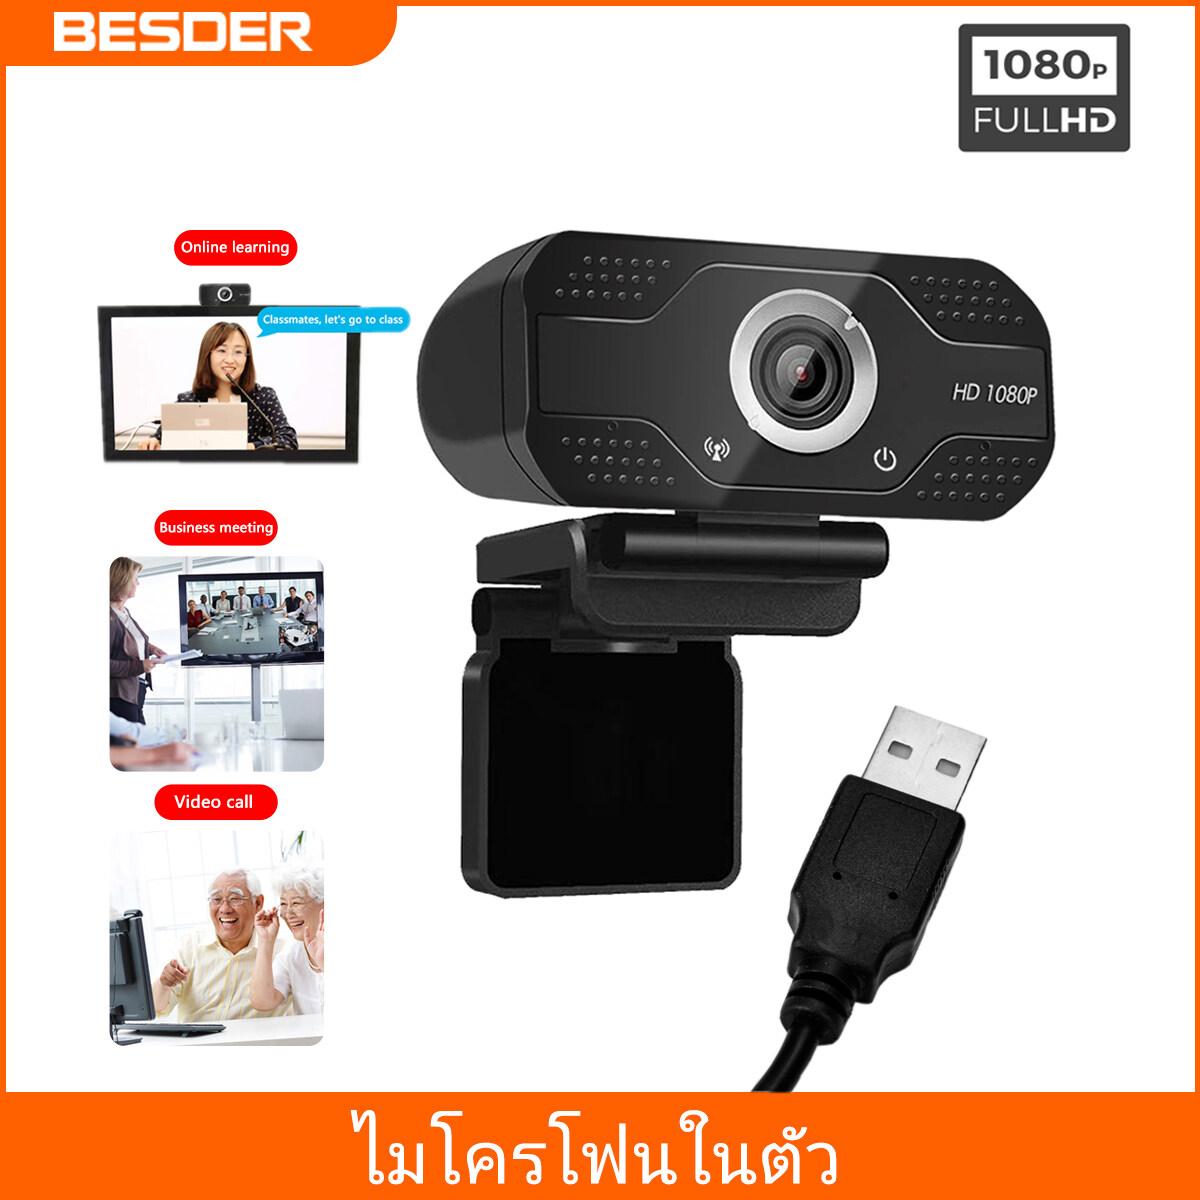 Besder Webcam 1080p 130° Wide Angle Auto Focus Webcam Hd Usb Plug And Play Desktop Laptops Webcam Buil-In Microphone.